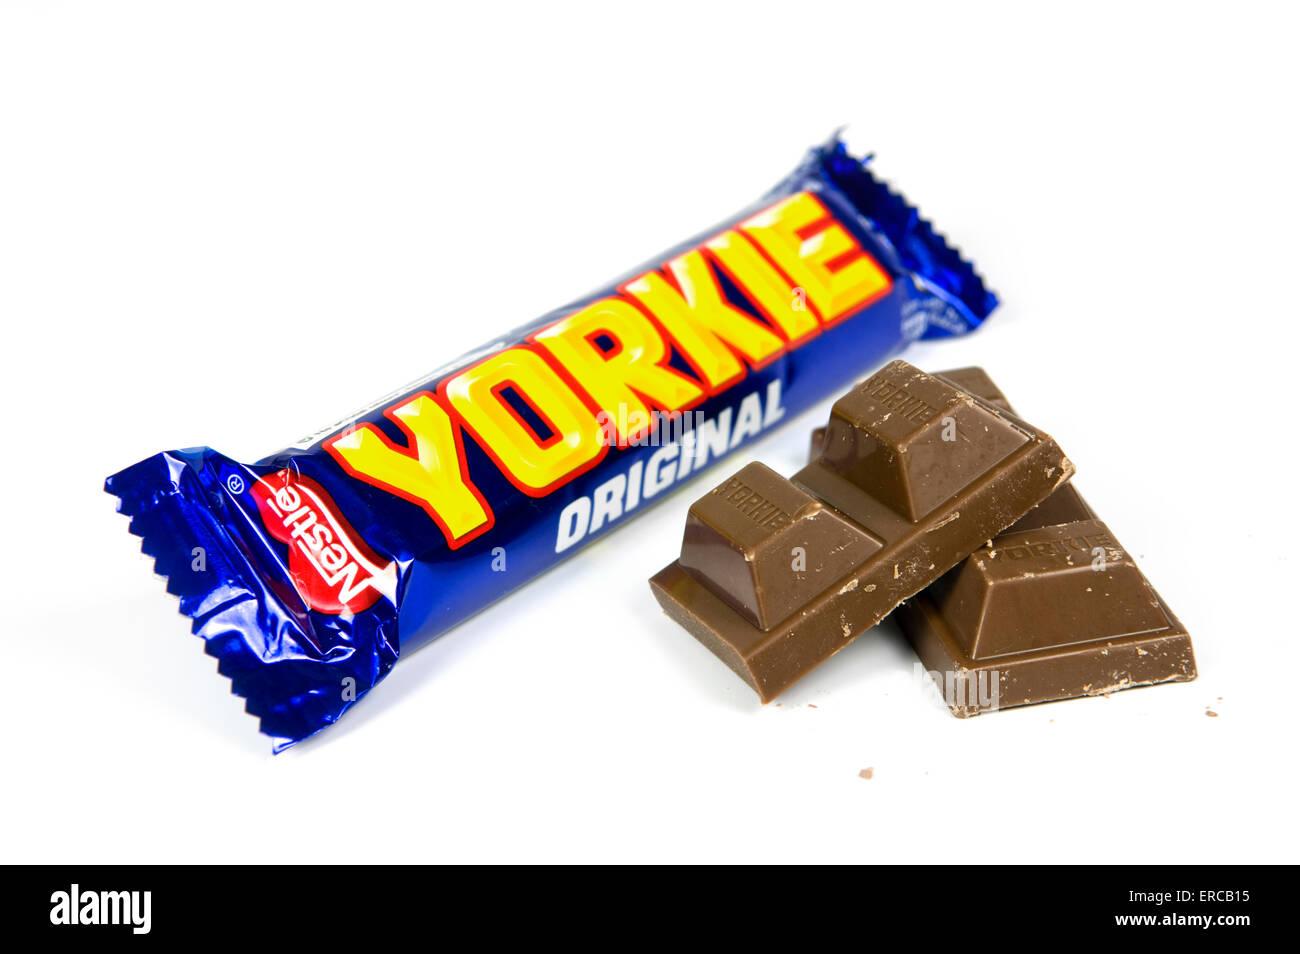 Yorkie Bar Stock Photos & Yorkie Bar Stock Images - Alamy